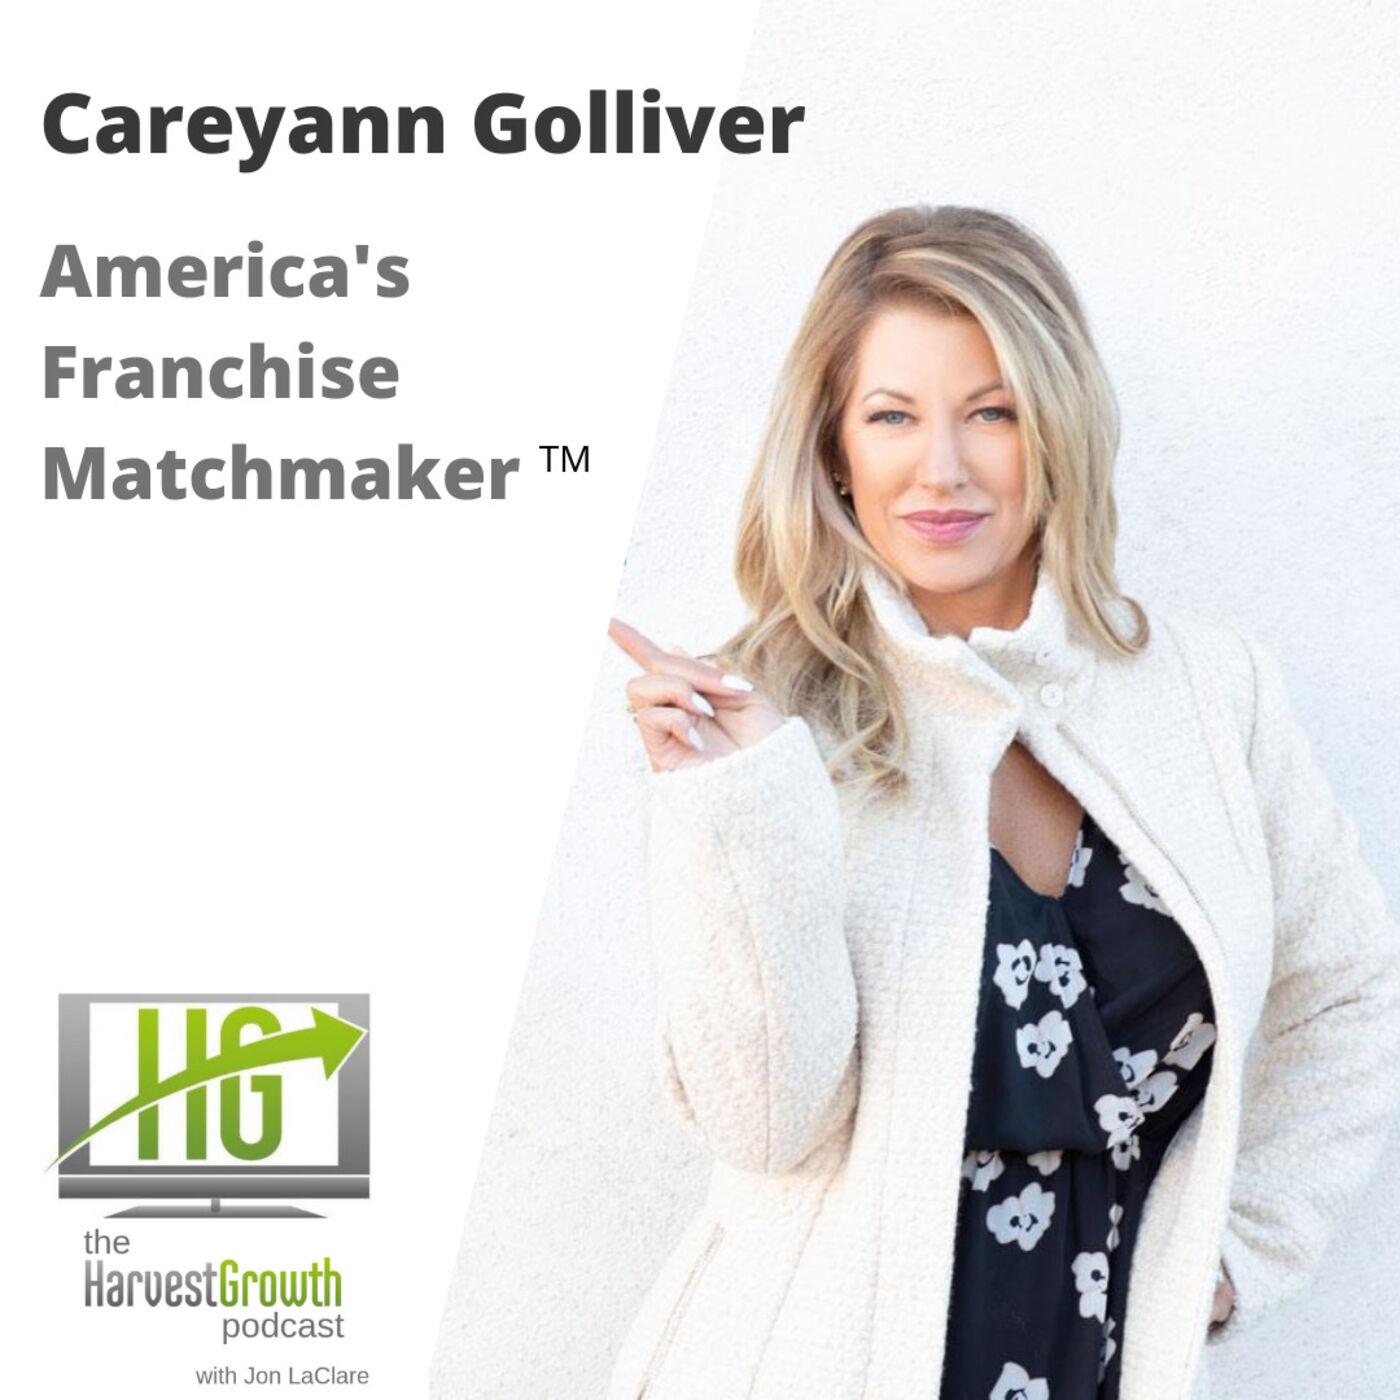 America's Franchise Matchmaker: Careyann Golliver